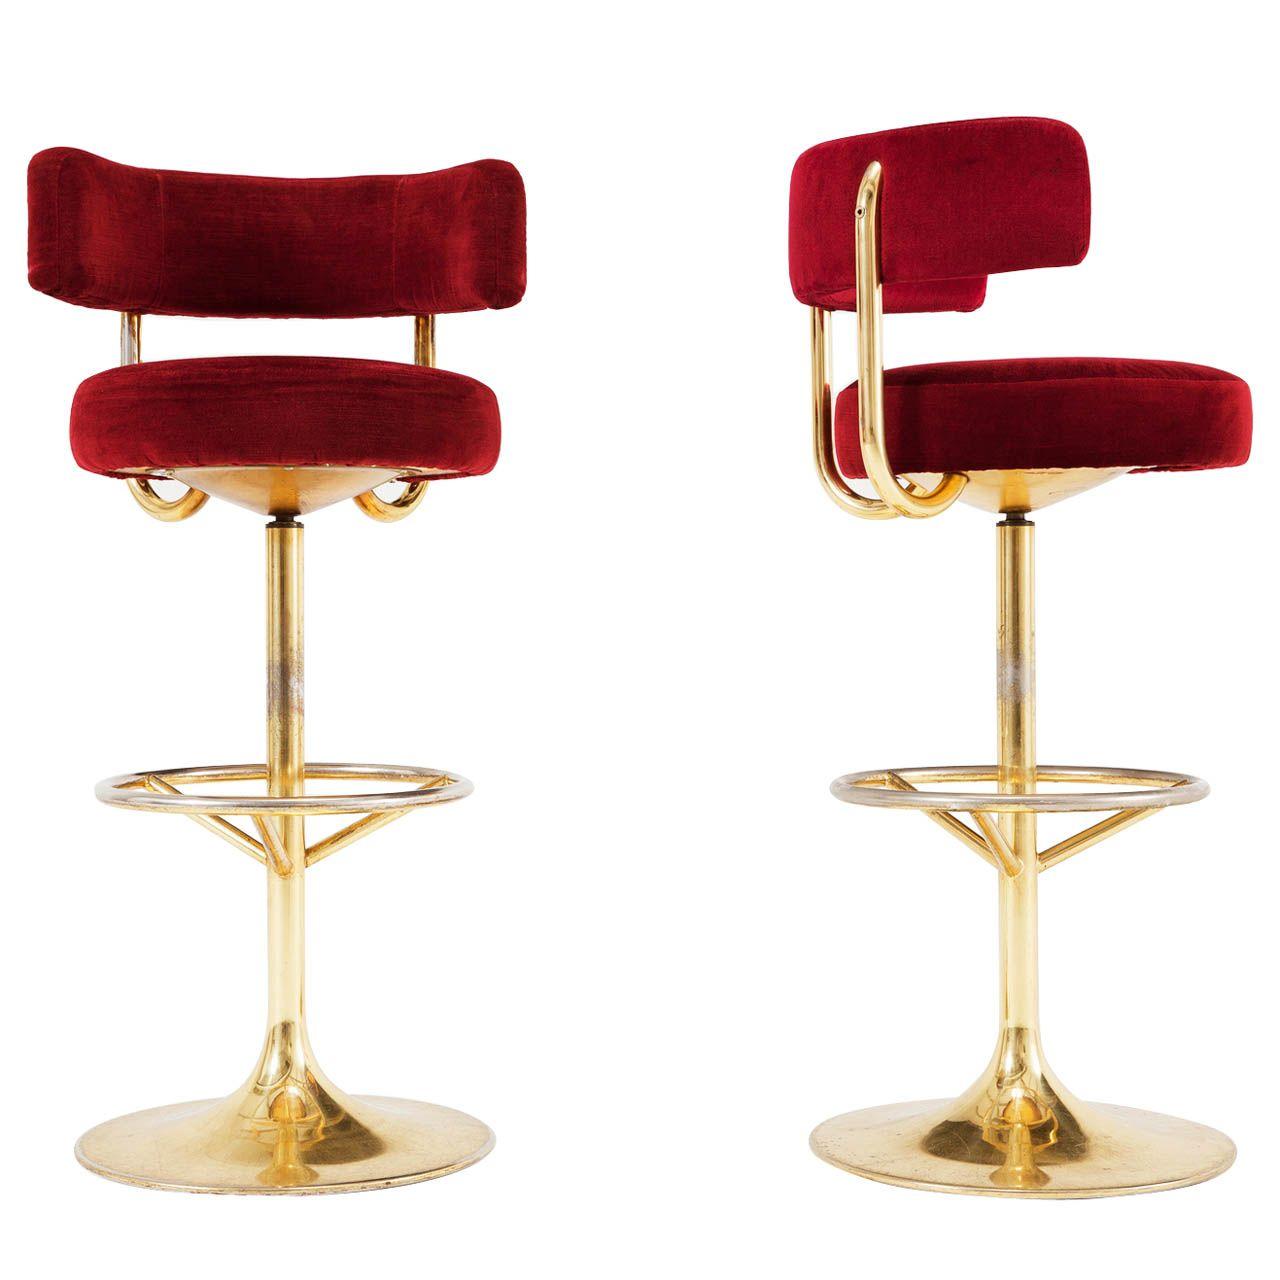 pair of brass and red velvet barstools things for my new home rh pinterest com